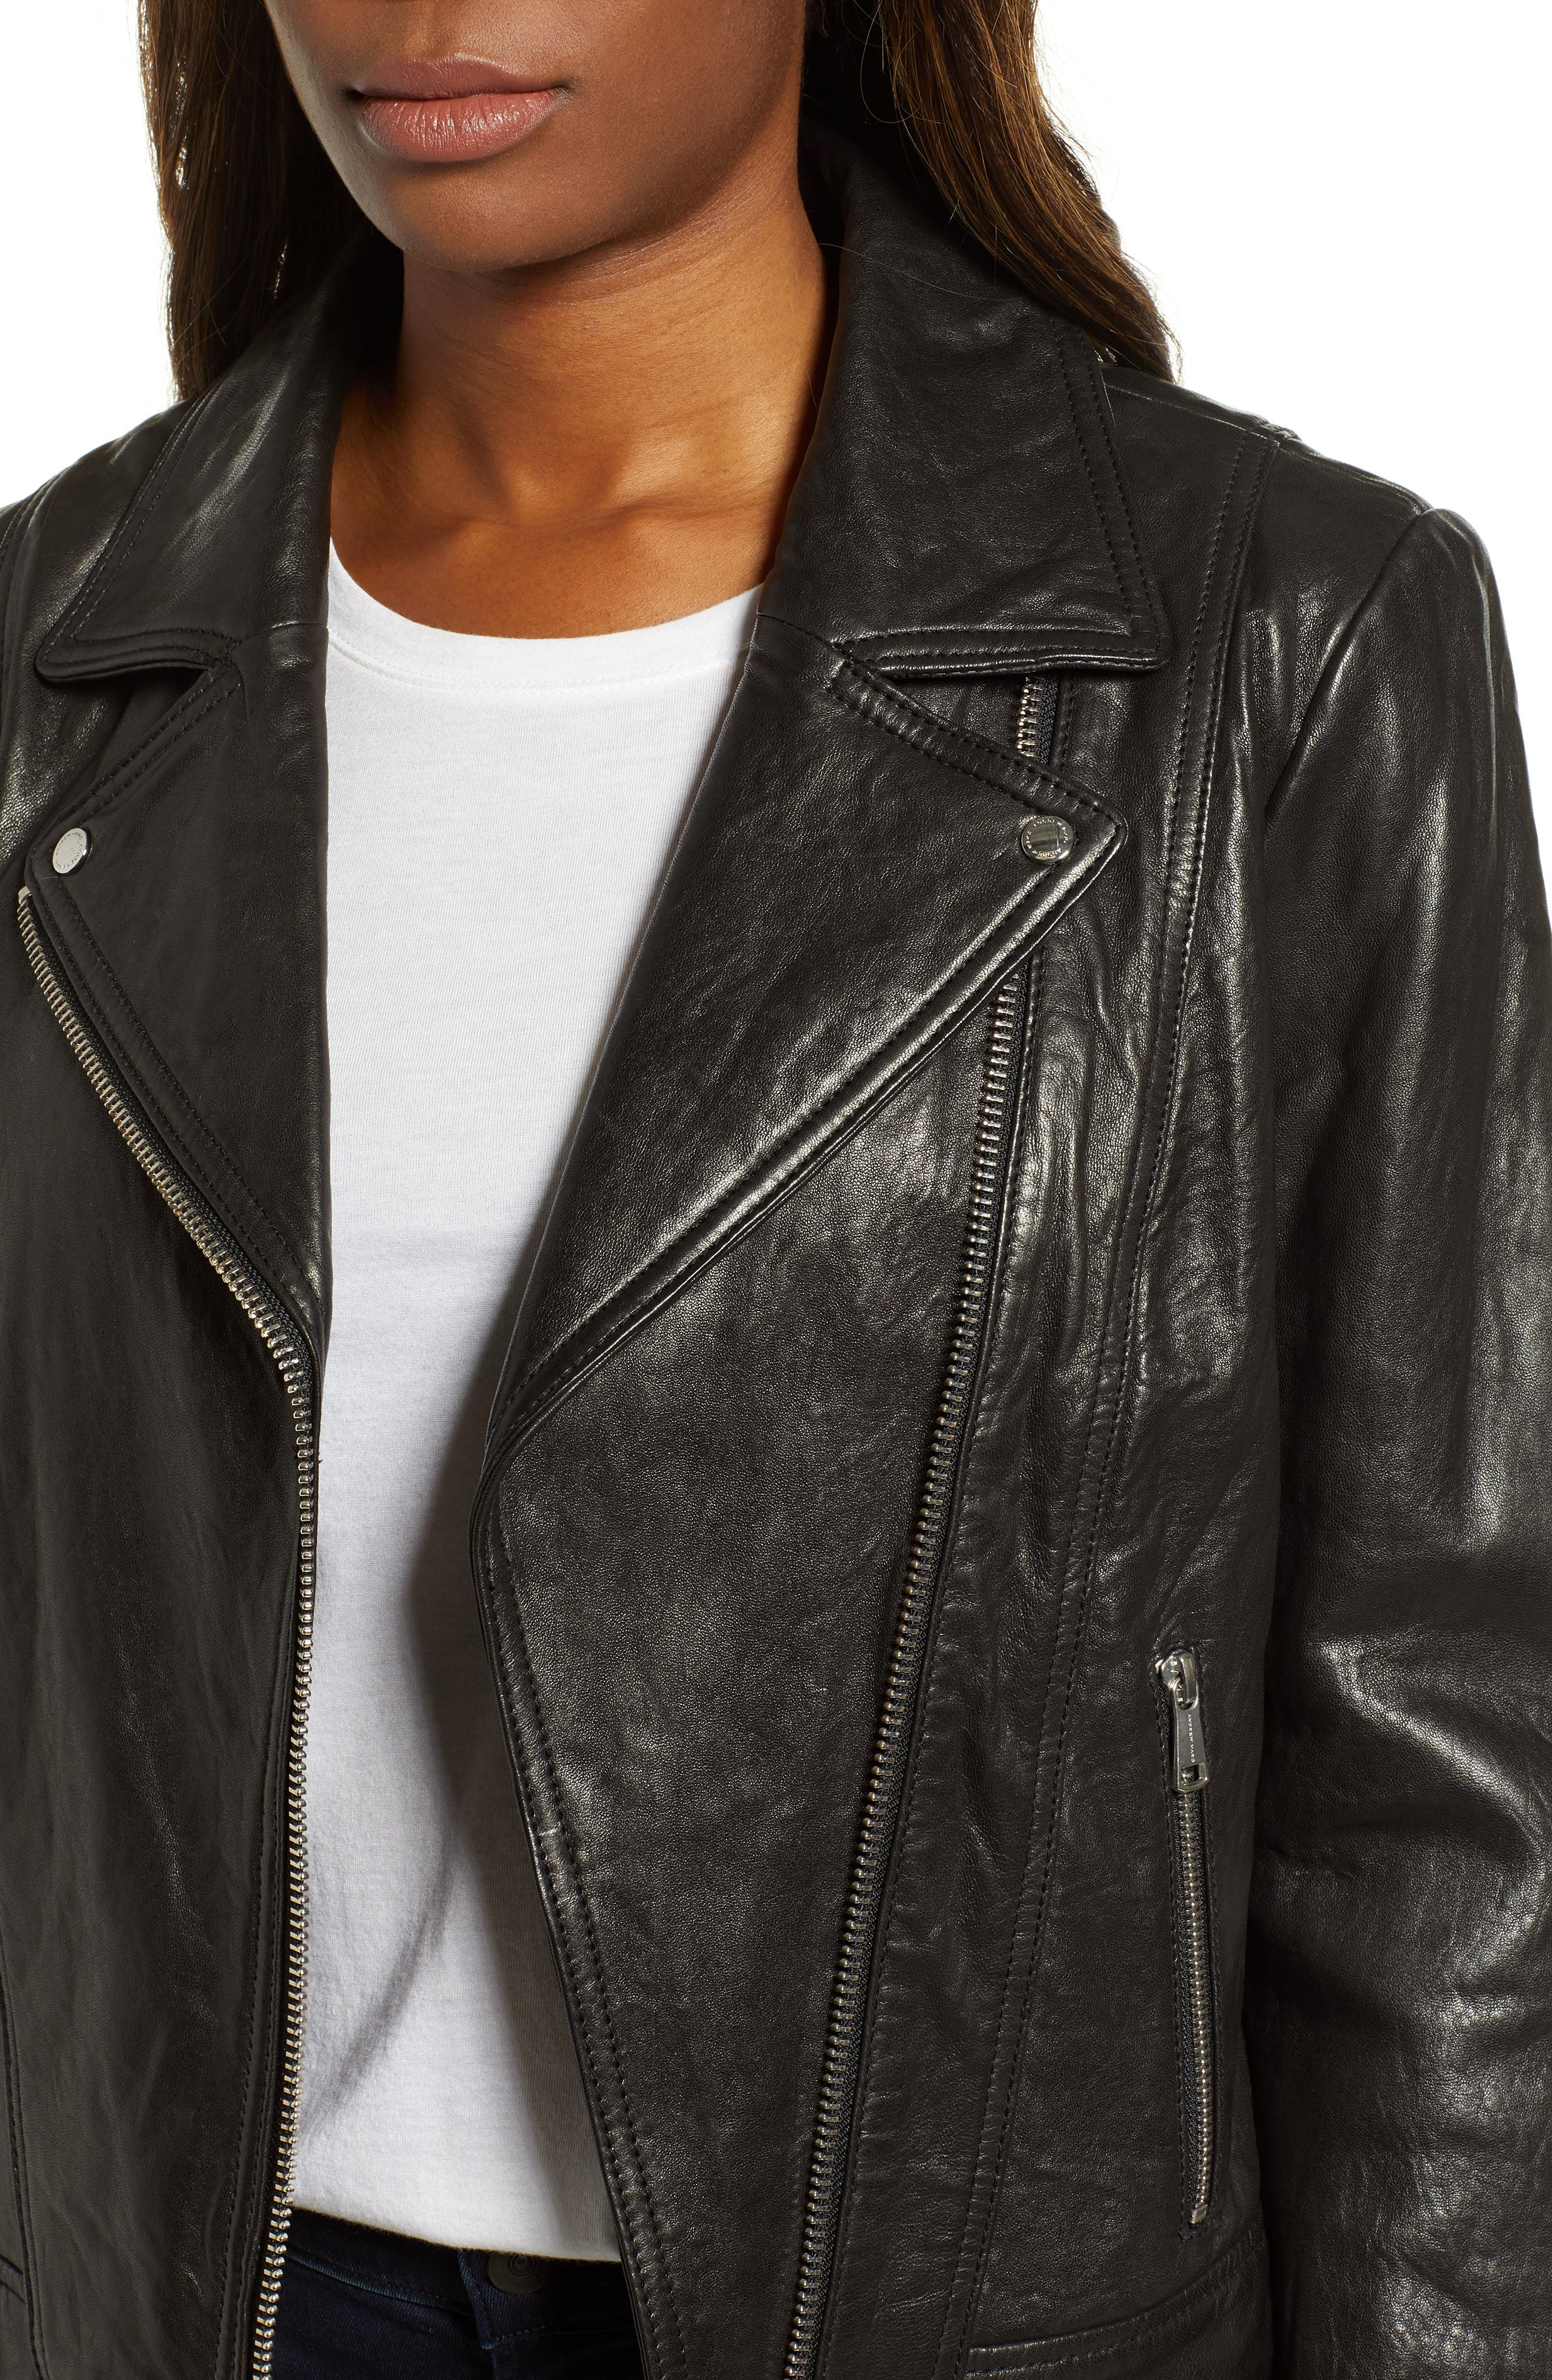 Washed Nappa Leather Moto Jacket,                             Alternate thumbnail 4, color,                             BLACK